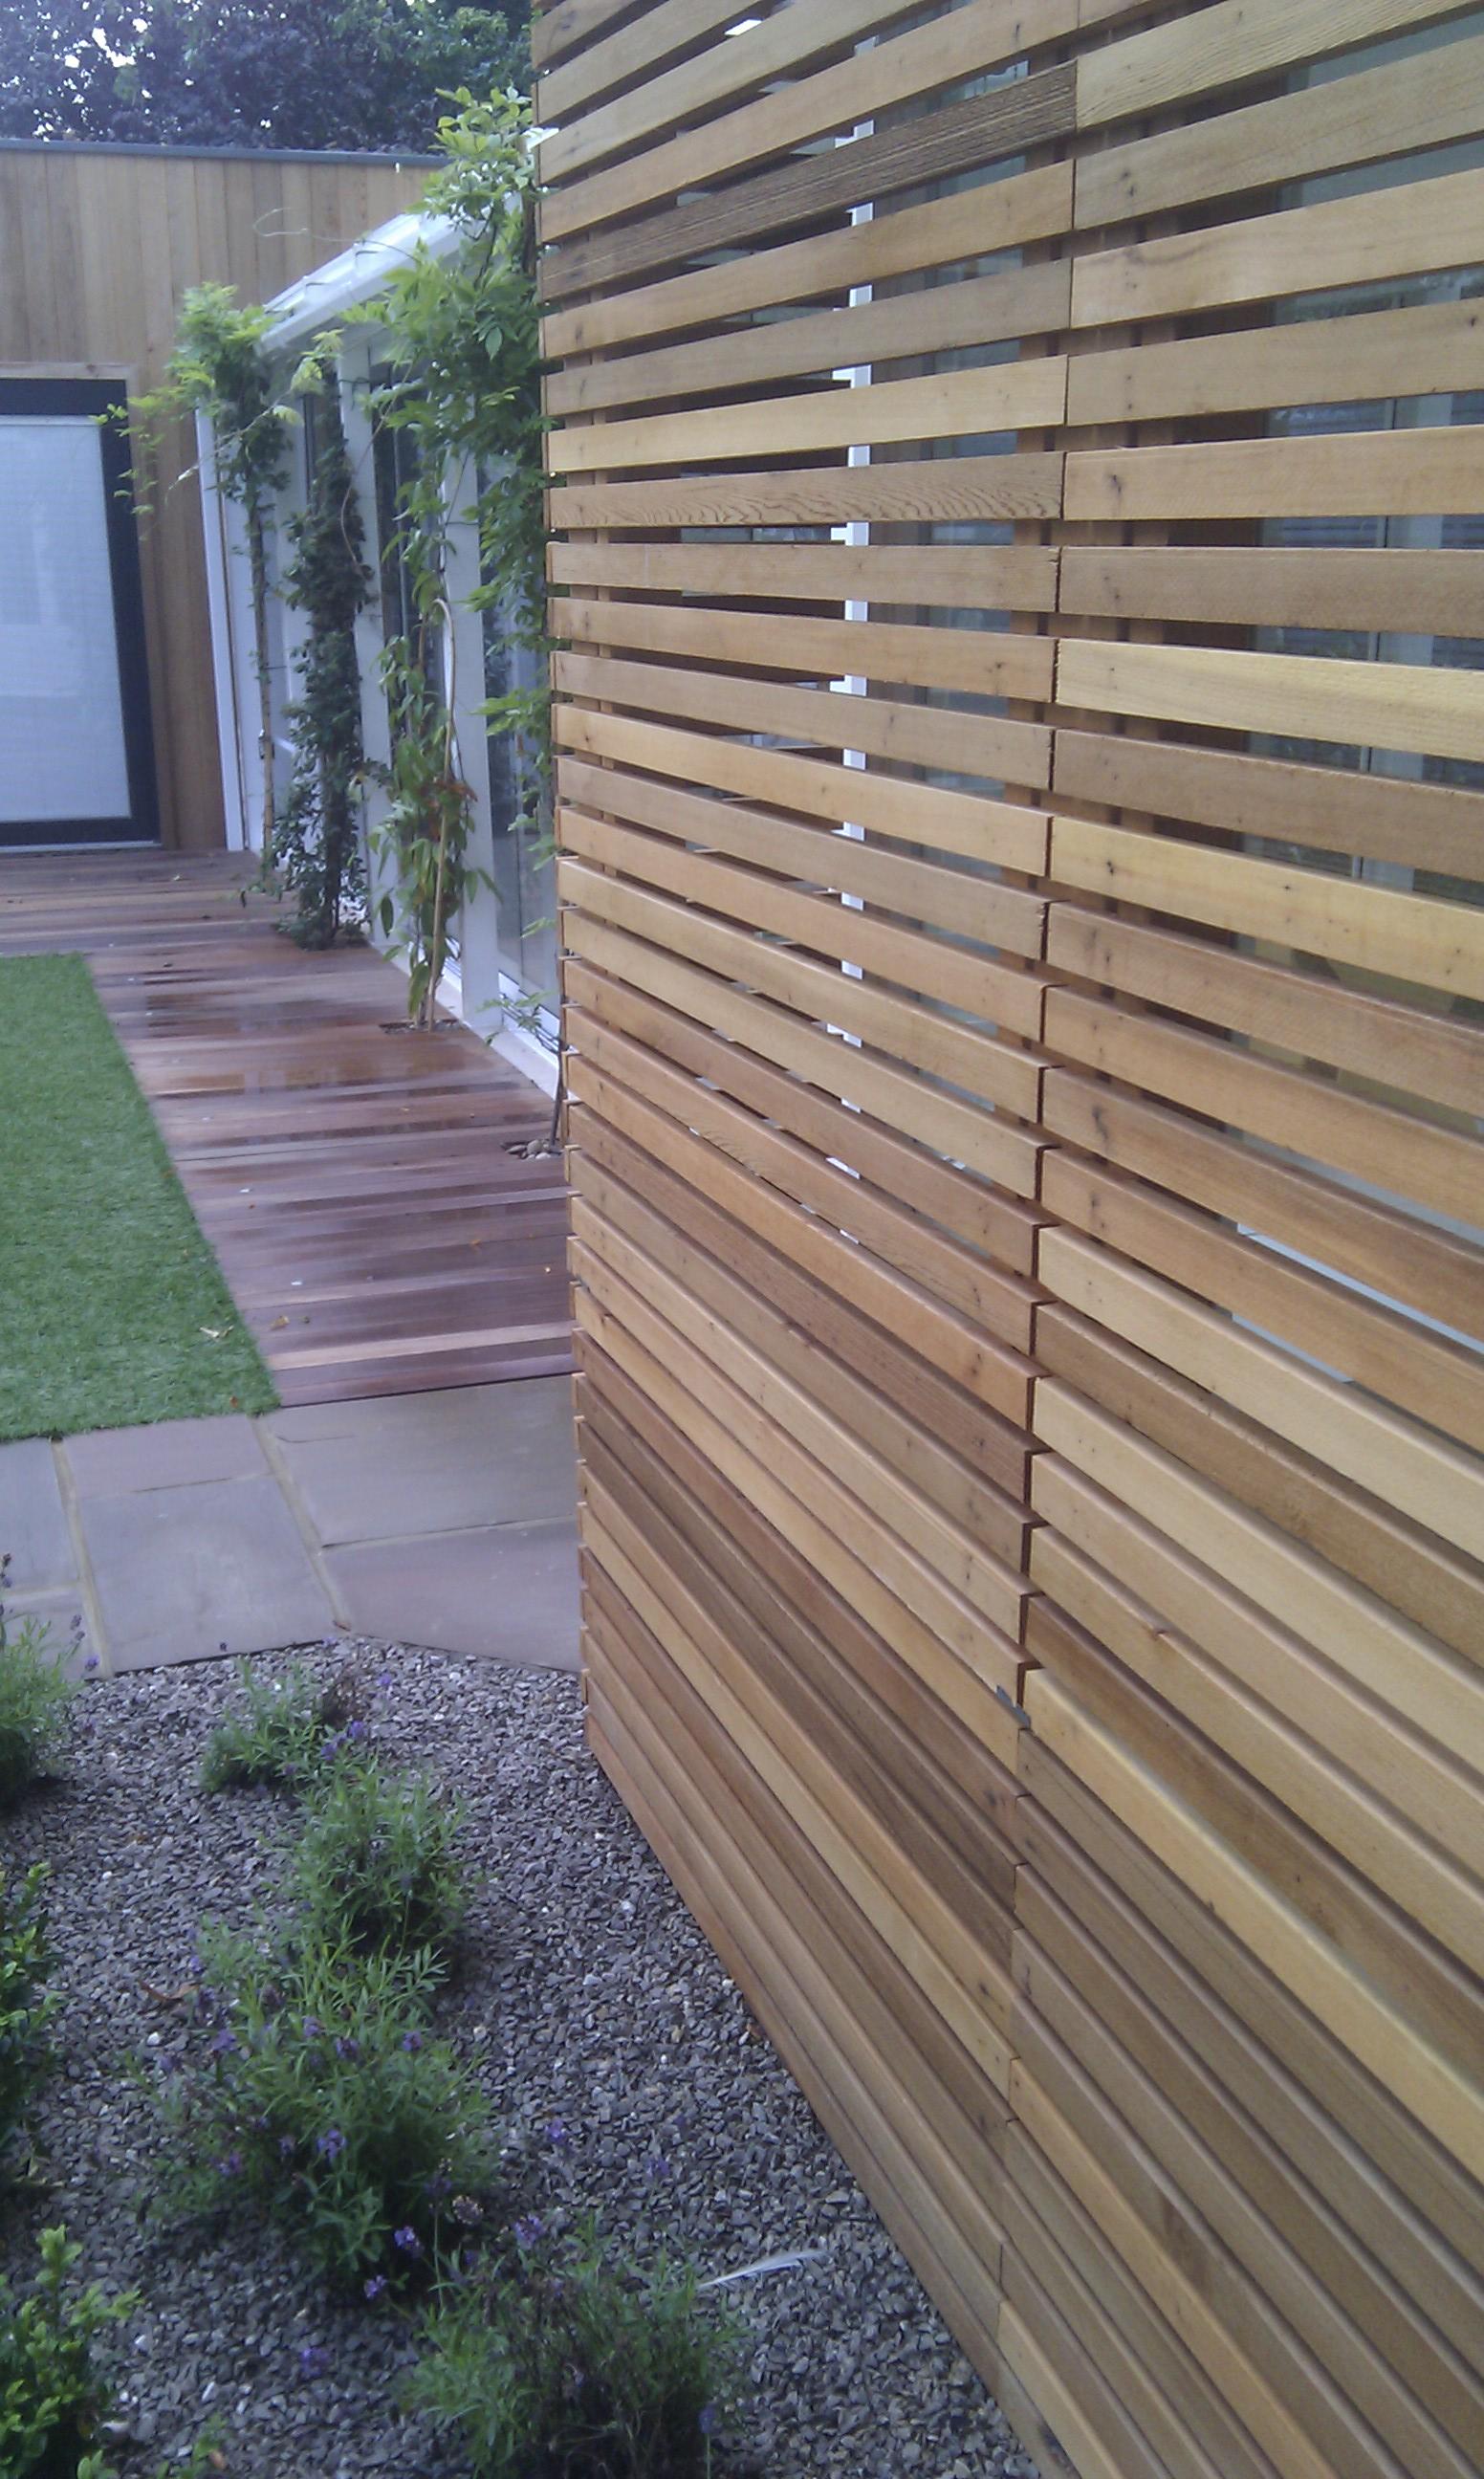 modern garden design london slatted grey privacy screen sandstone paving easy grass balau hardwood decking (23)